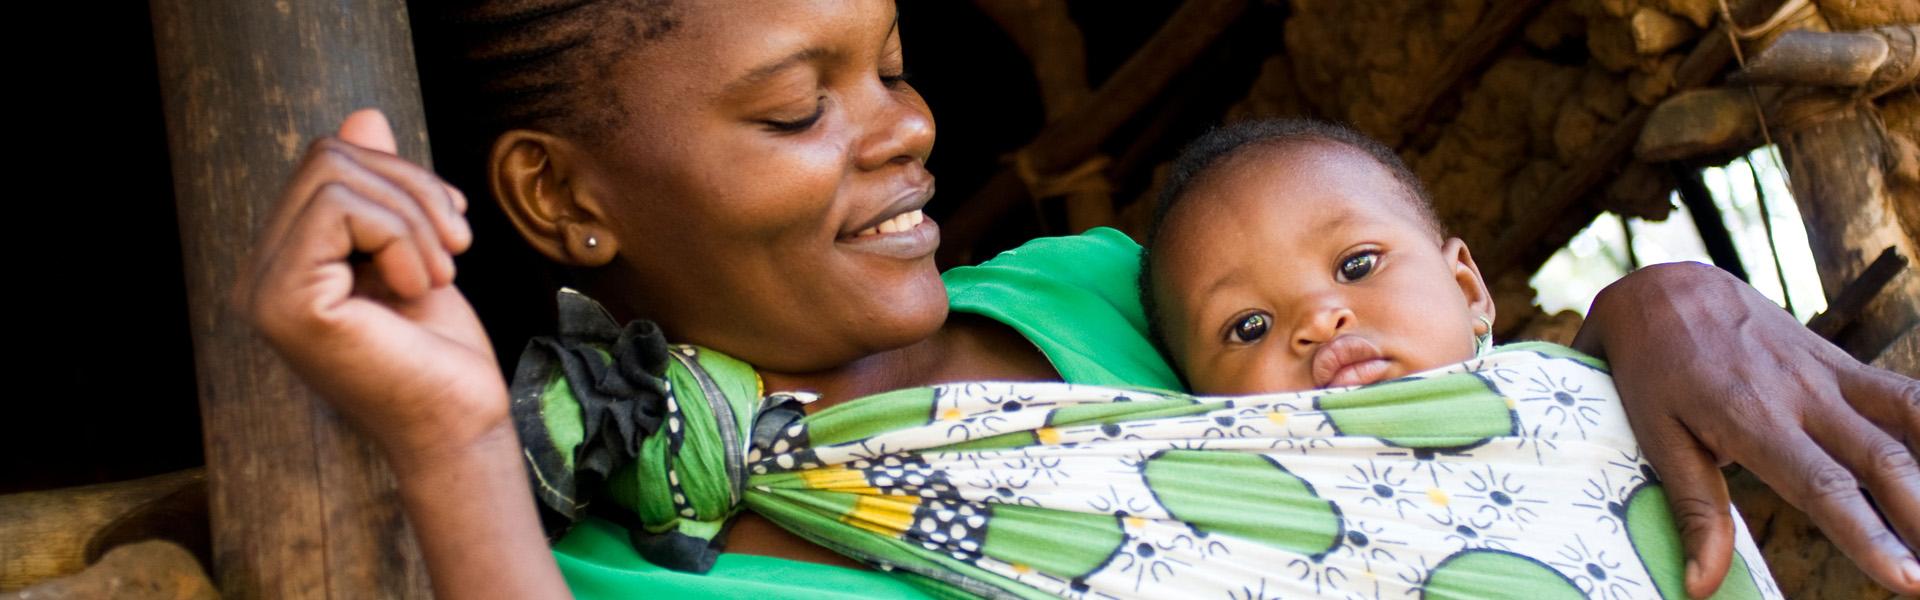 Mother and child in village at Gedi, Malindi Kenya